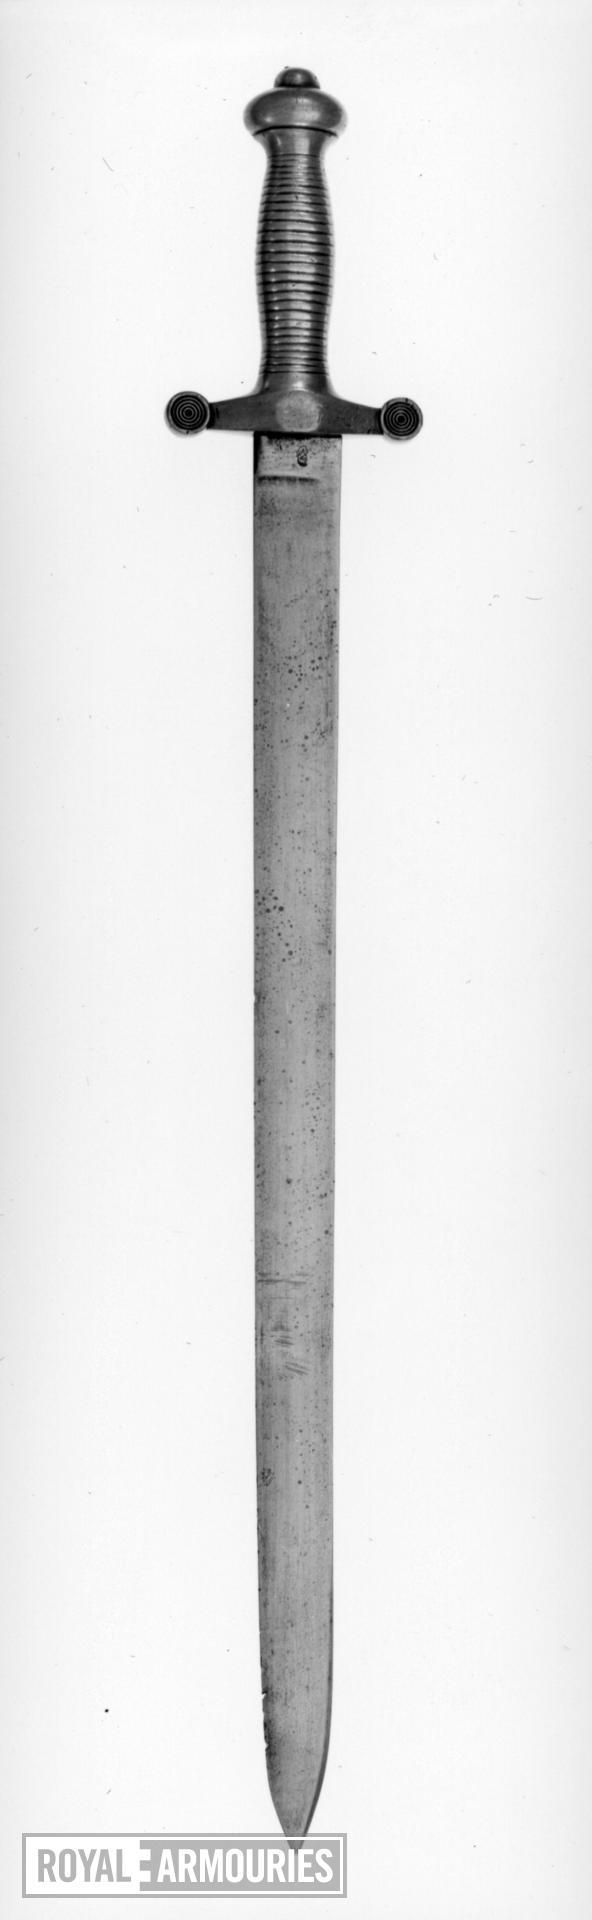 Sword - Land Transport Corps sword